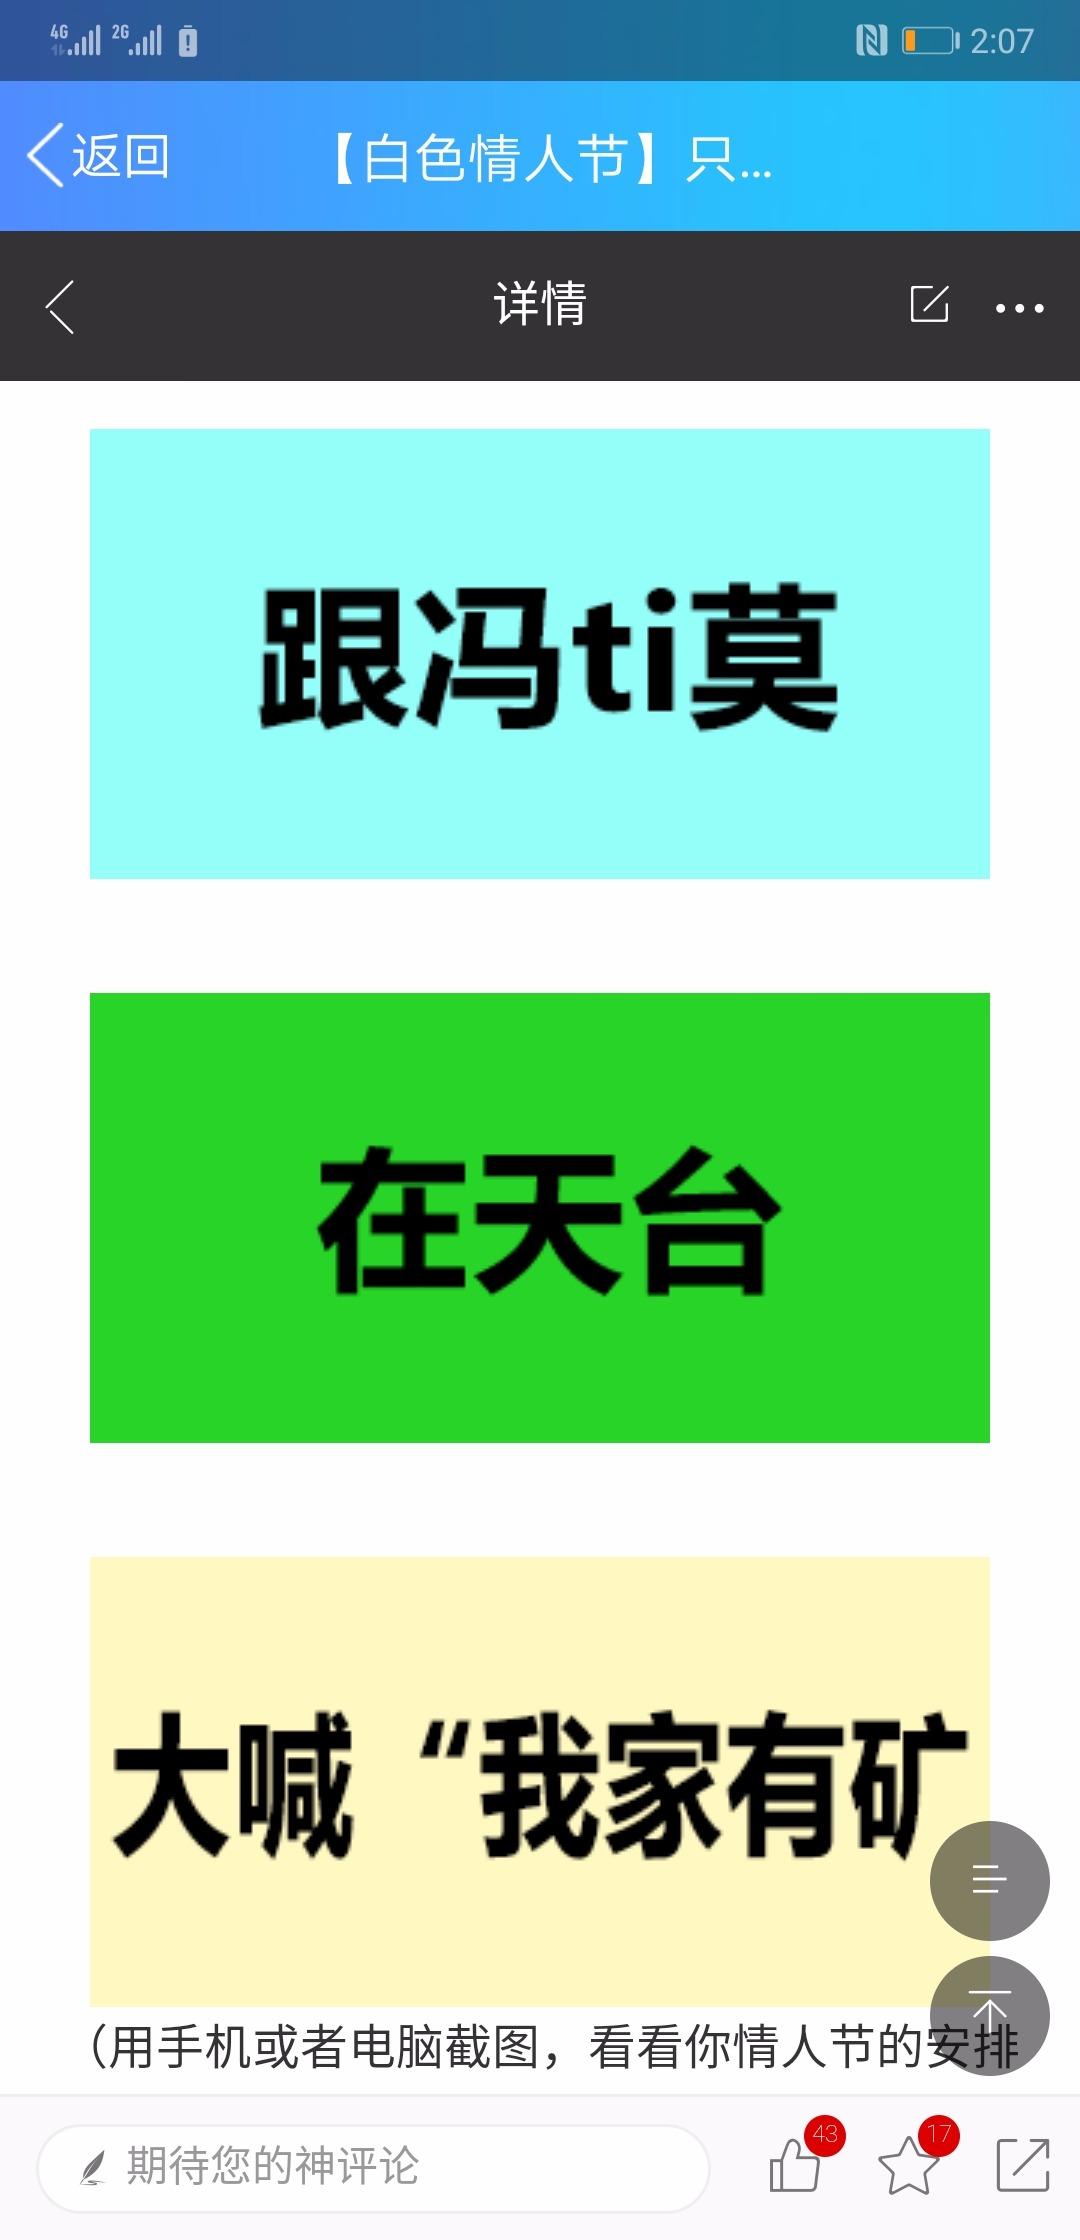 Screenshot_20190314_140709_com.tencent.mobileqq.jpg